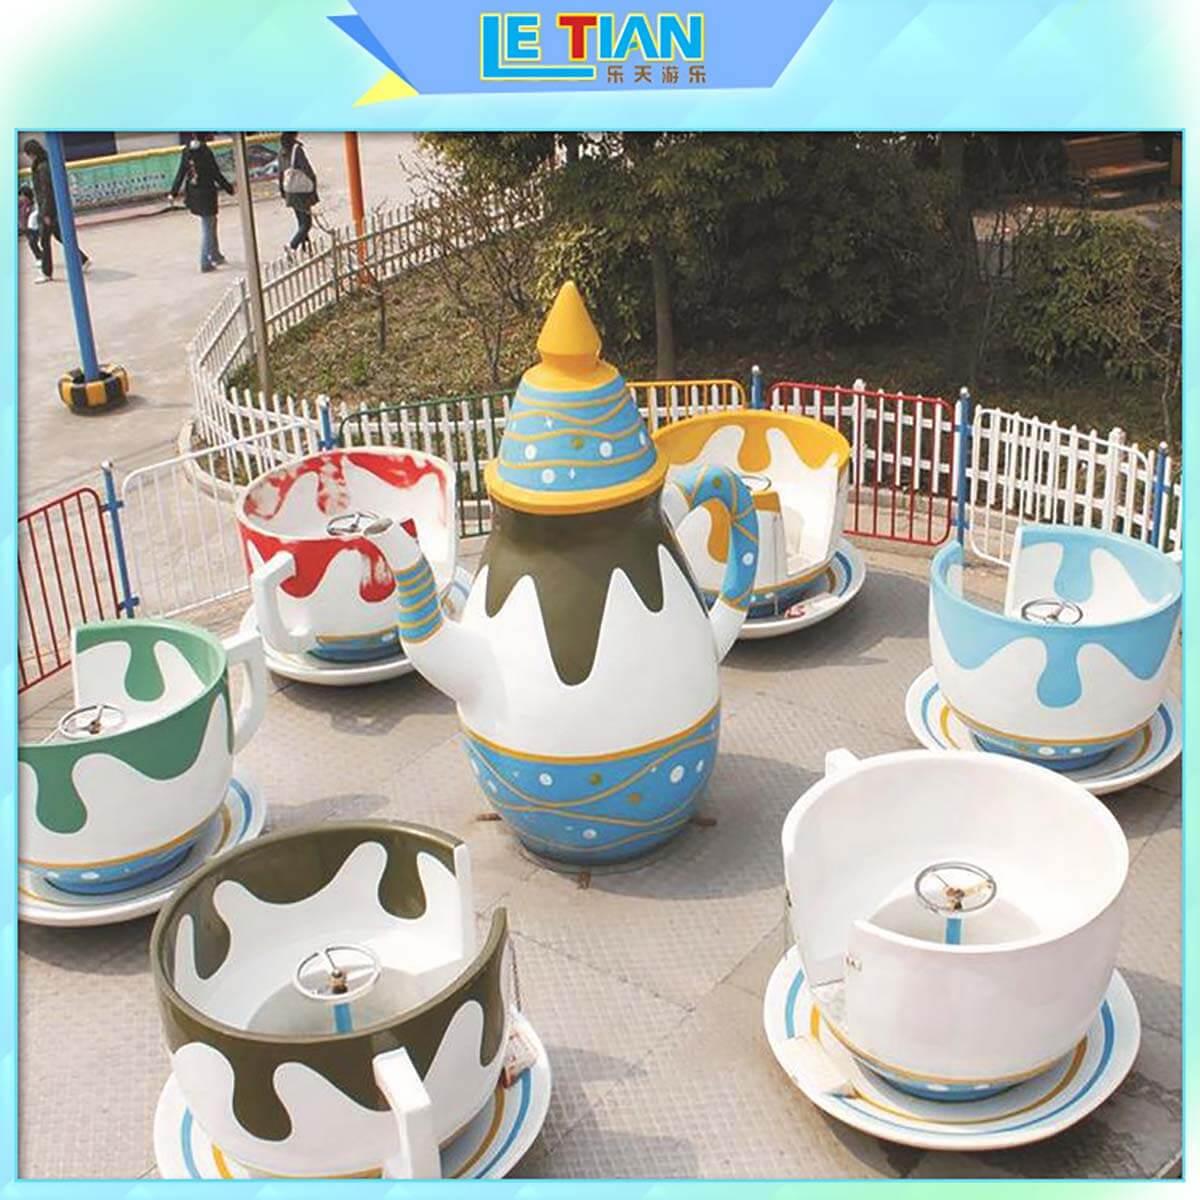 LETIAN electric types of amusement park rides facility entertainment-2